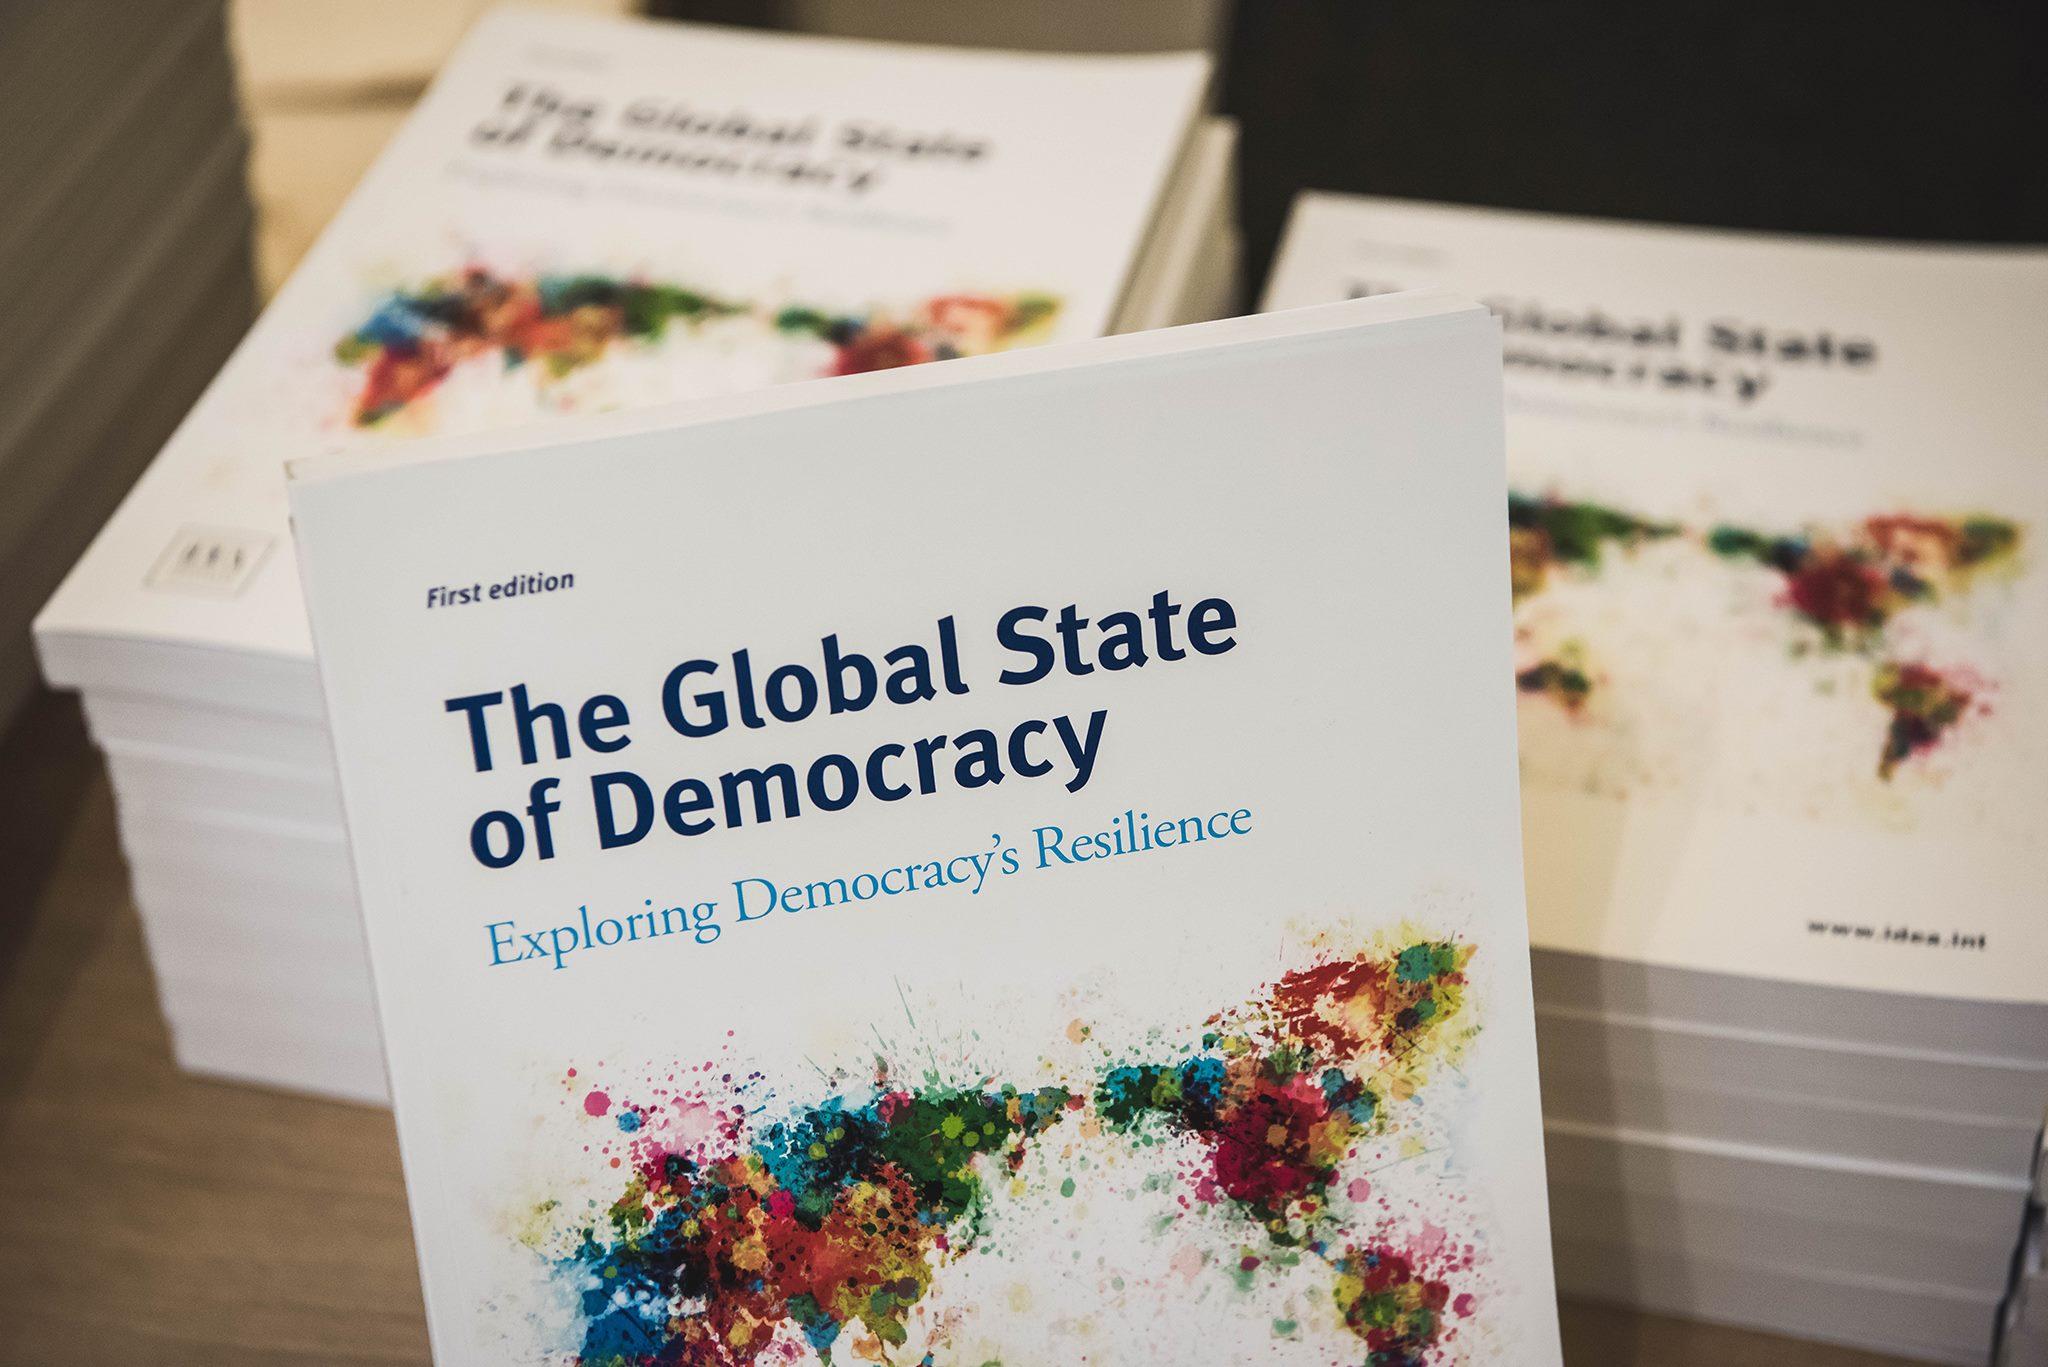 The Global State of Democracy publication. Image: International IDEA /Stuudio Huusmann